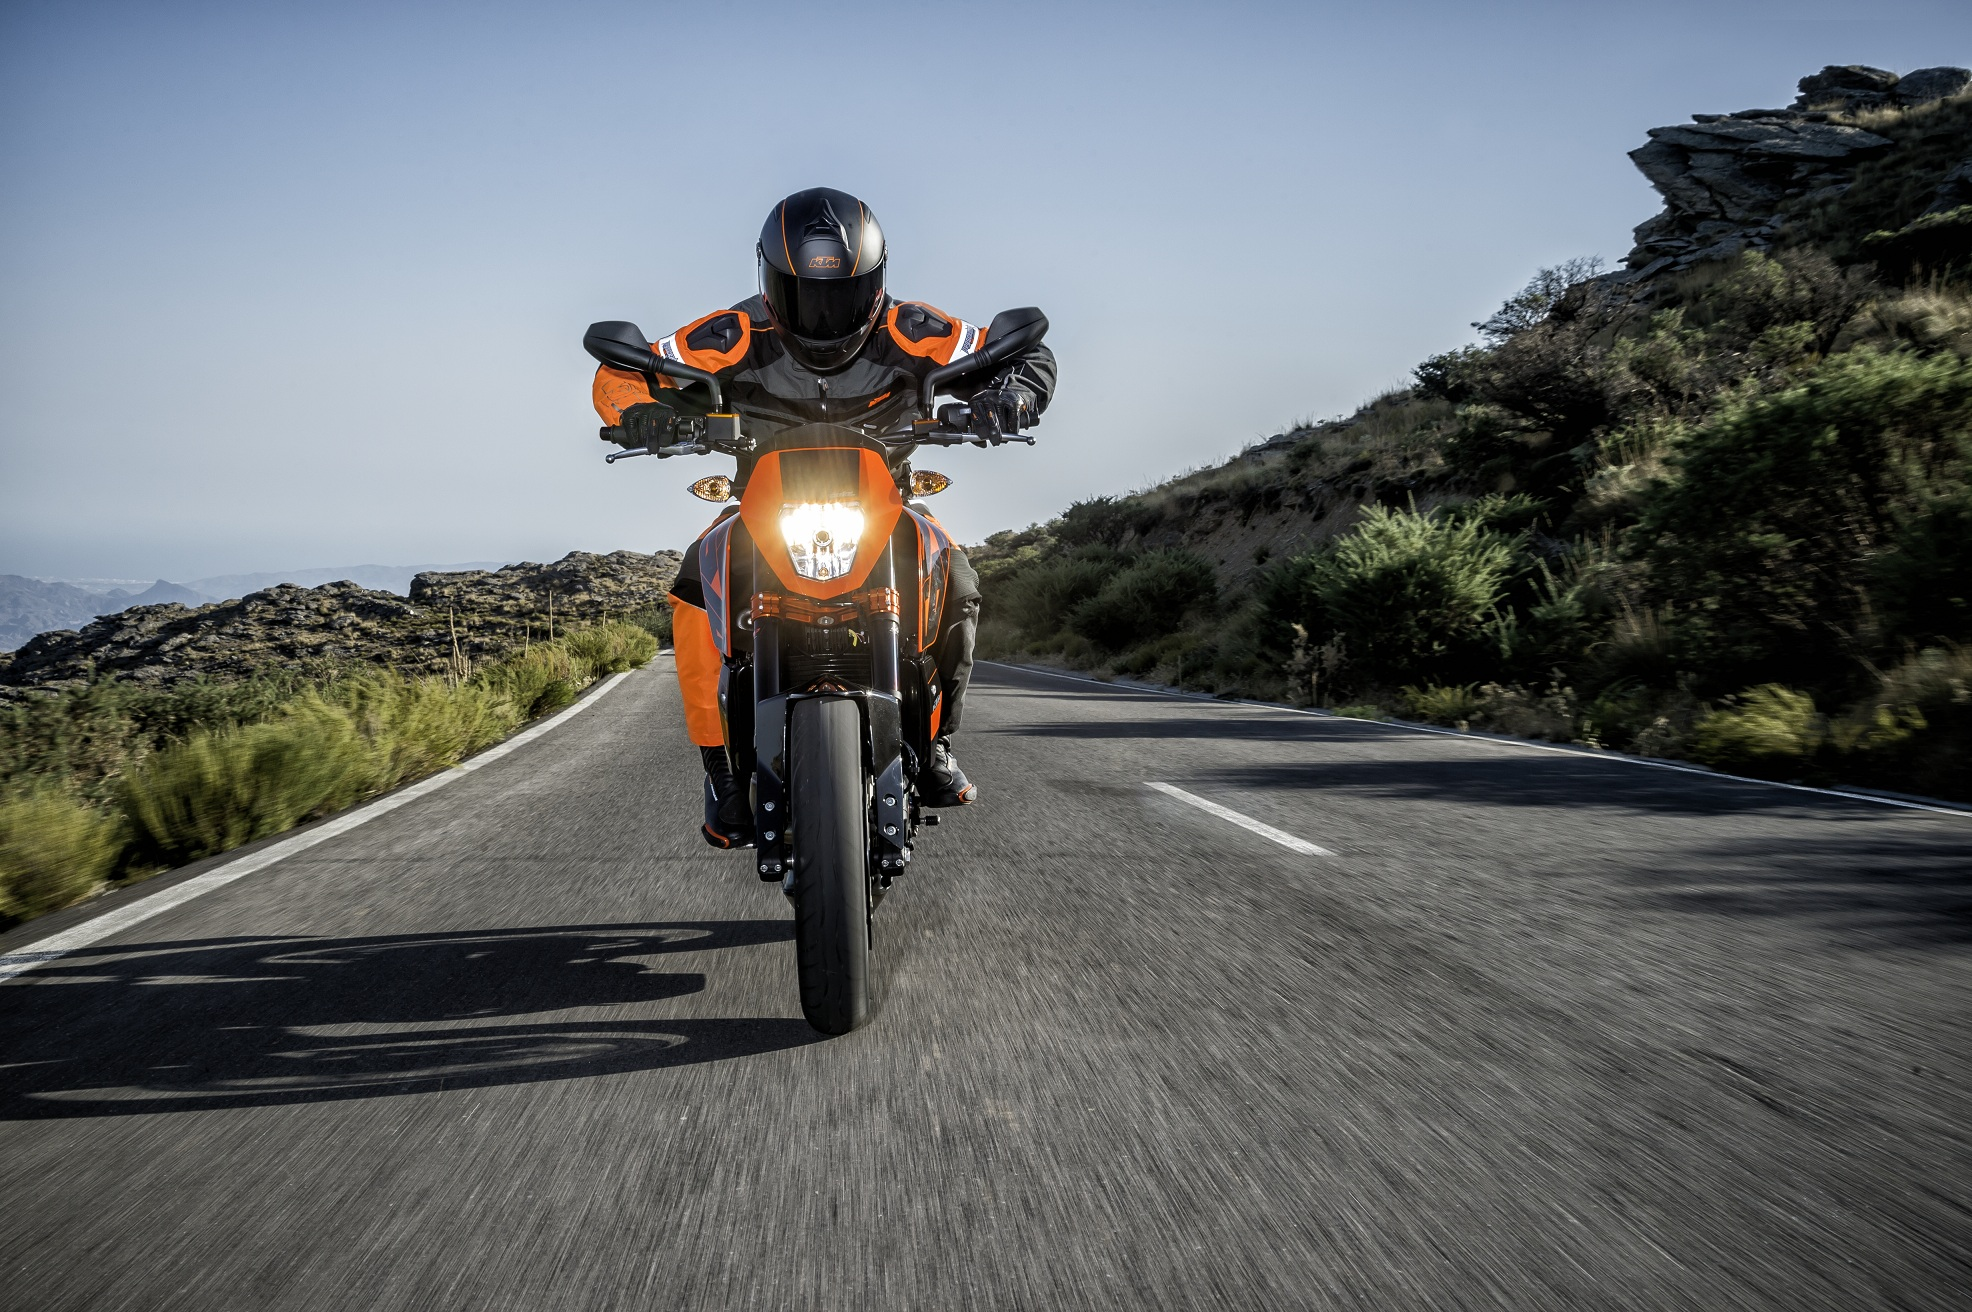 Three reasons to wait for a 2016 KTM 690 DUKE - KTM BLOG